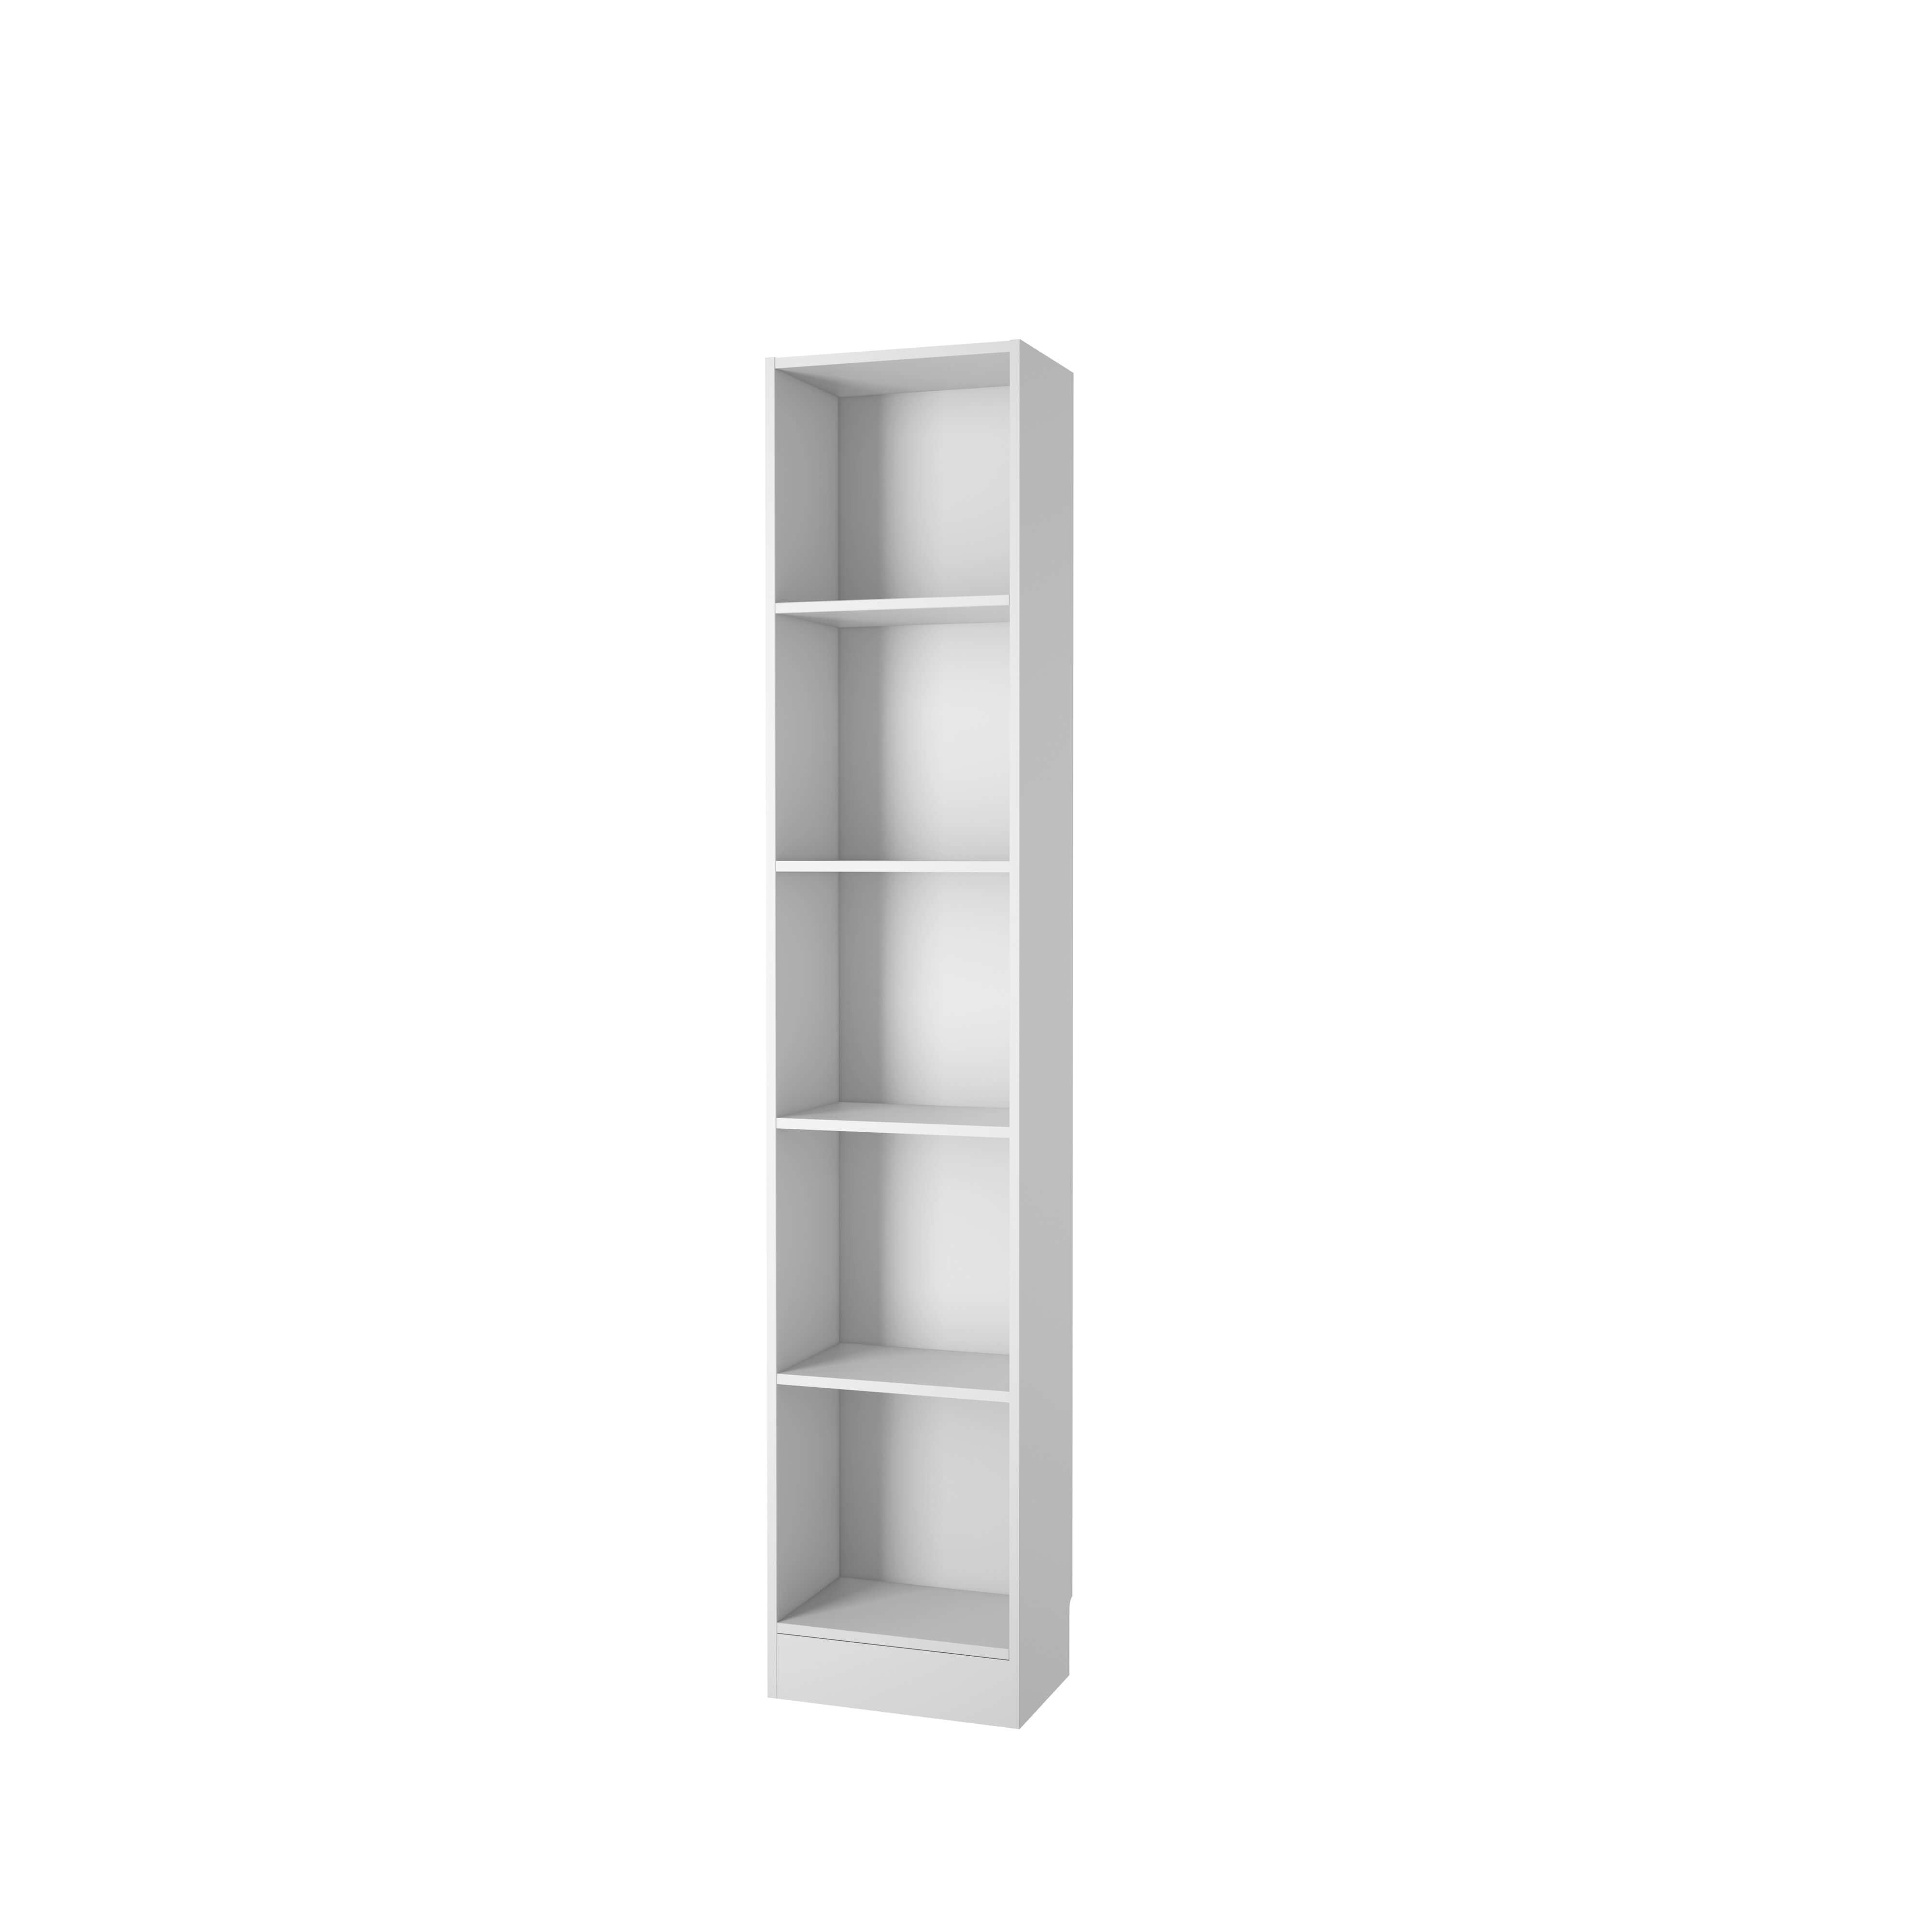 Basic bogkasse - hvid, m. 4 hylder